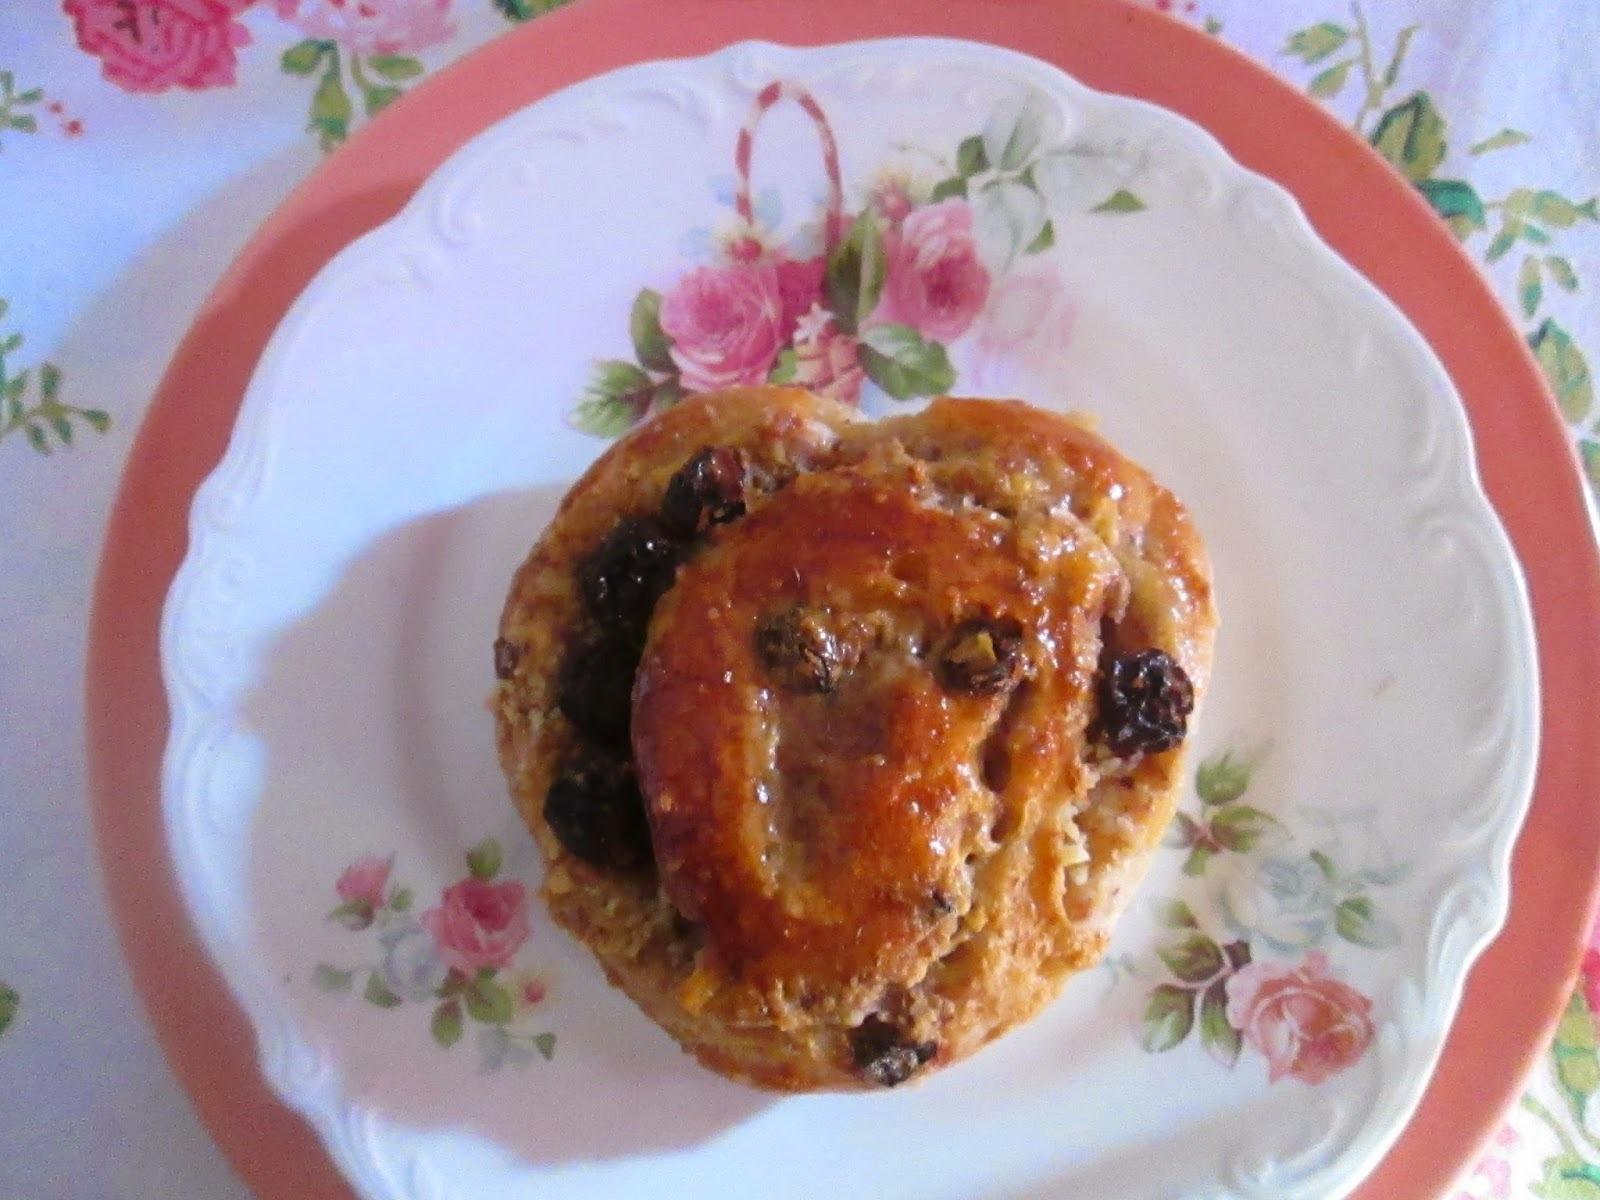 Pain aux raisins (pancitos con pasas)